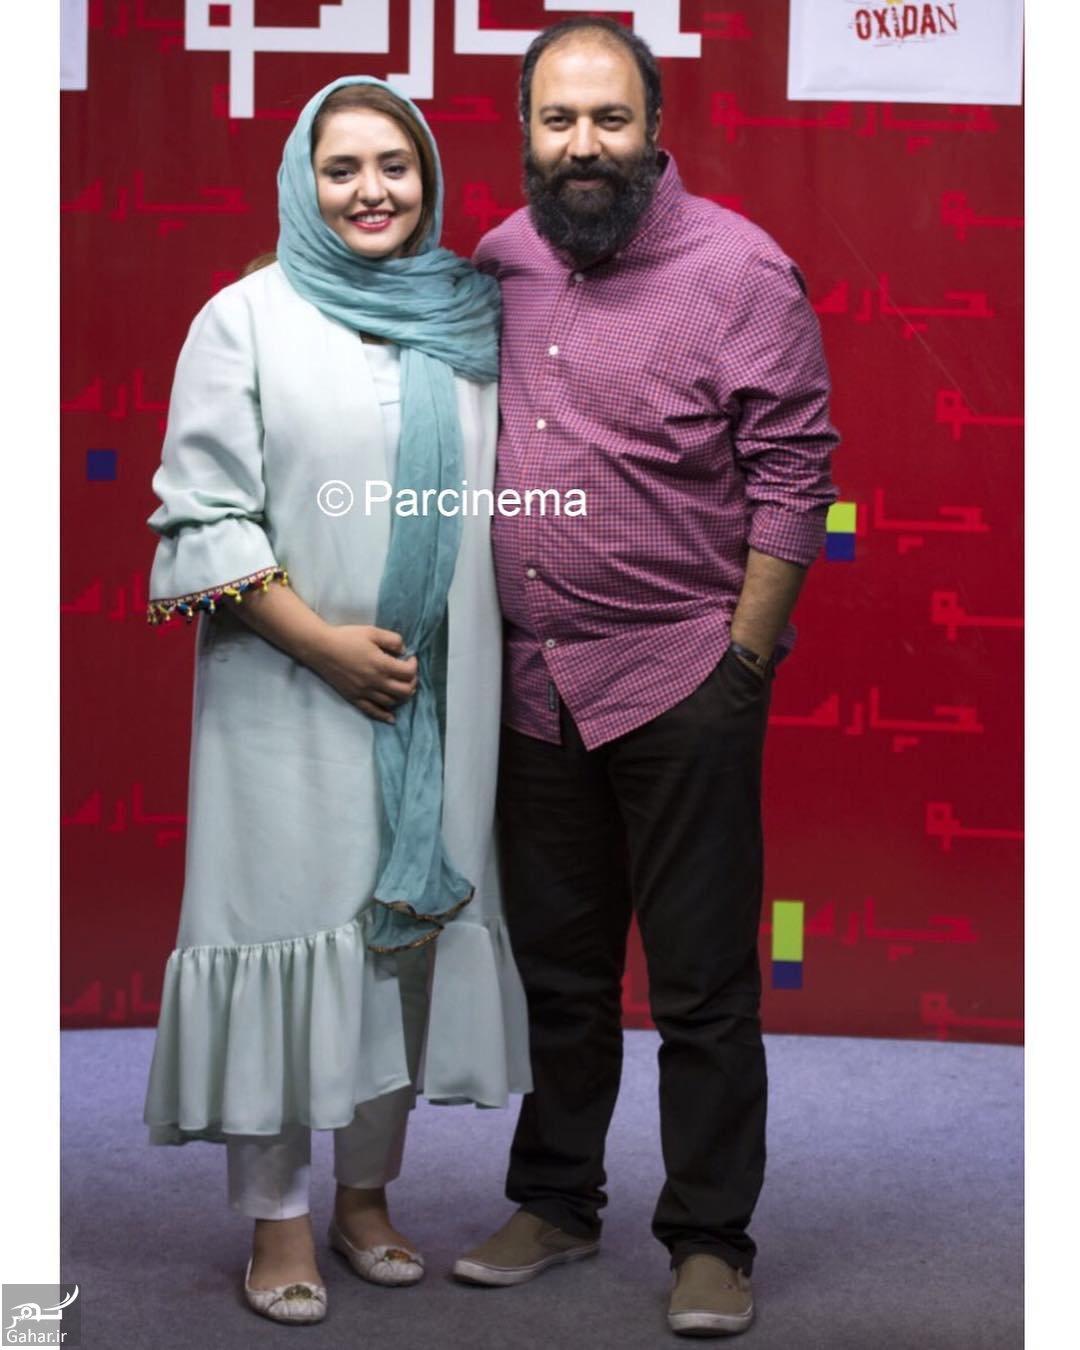 169845 Gahar ir عکس های متفاوت نرگس محمدی و همسرش در اکران مردمی فیلم اکسیدان